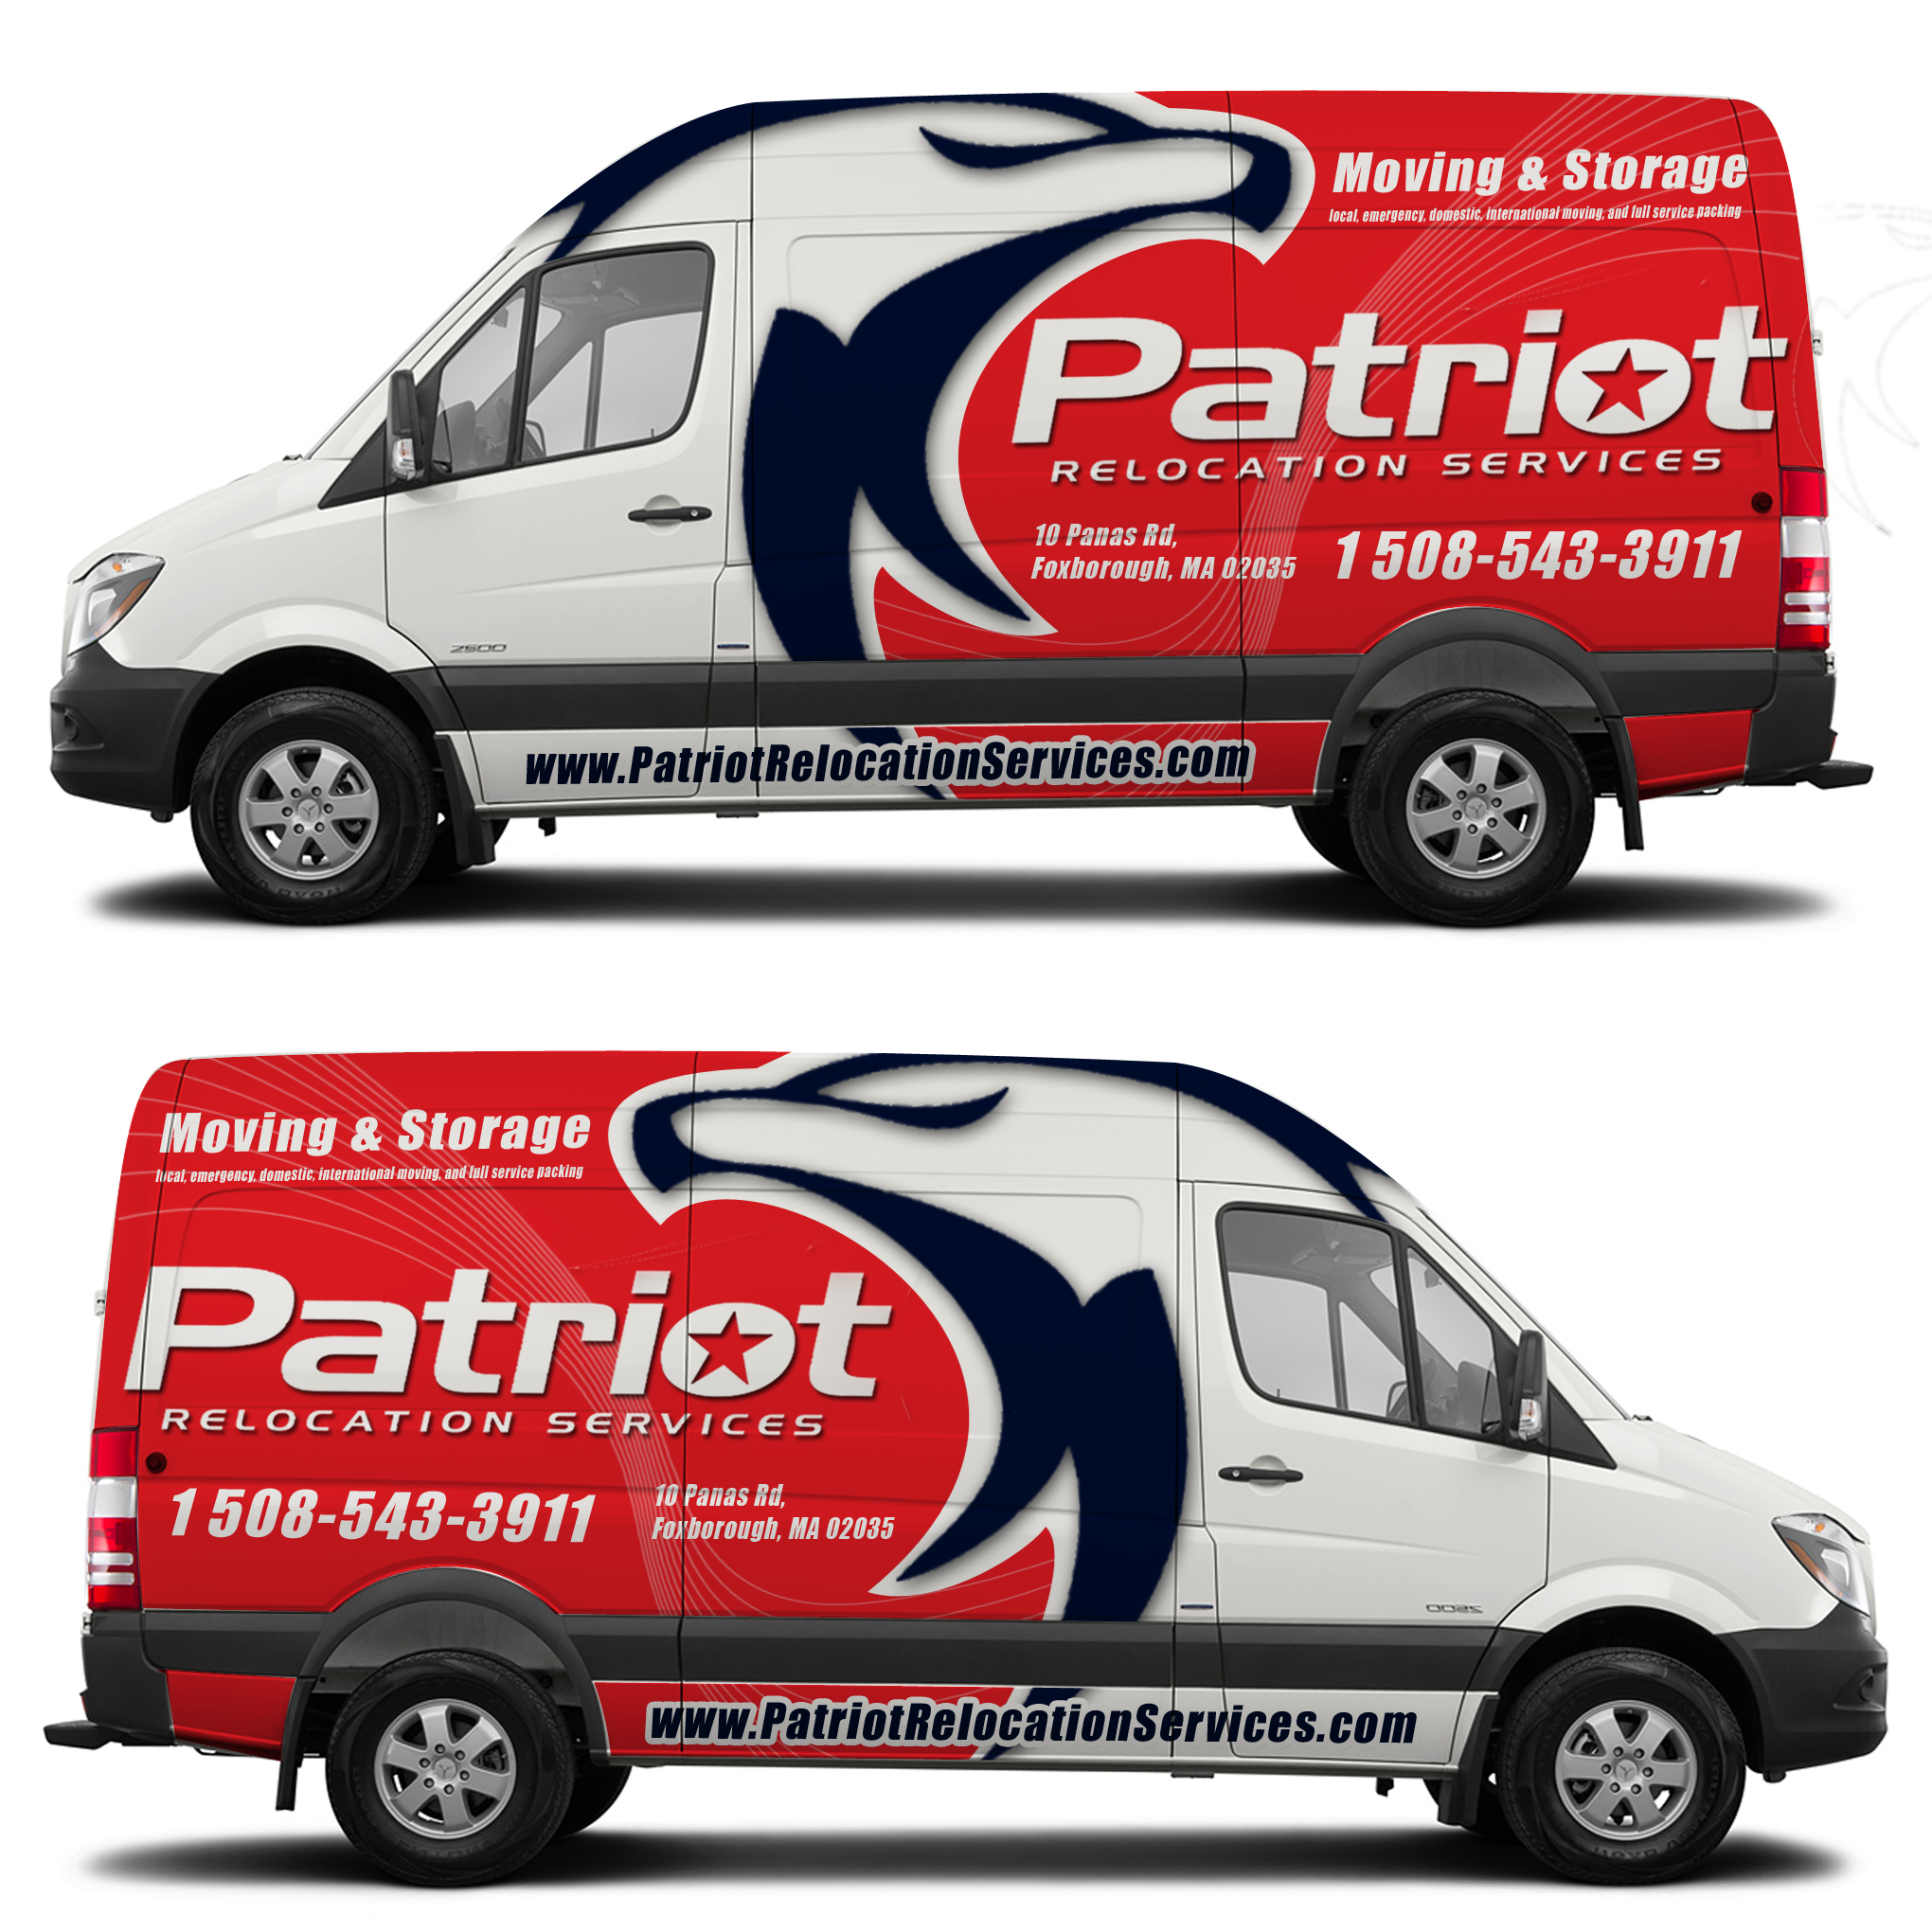 High-end Moving Company Seeking Truck/van Wrap